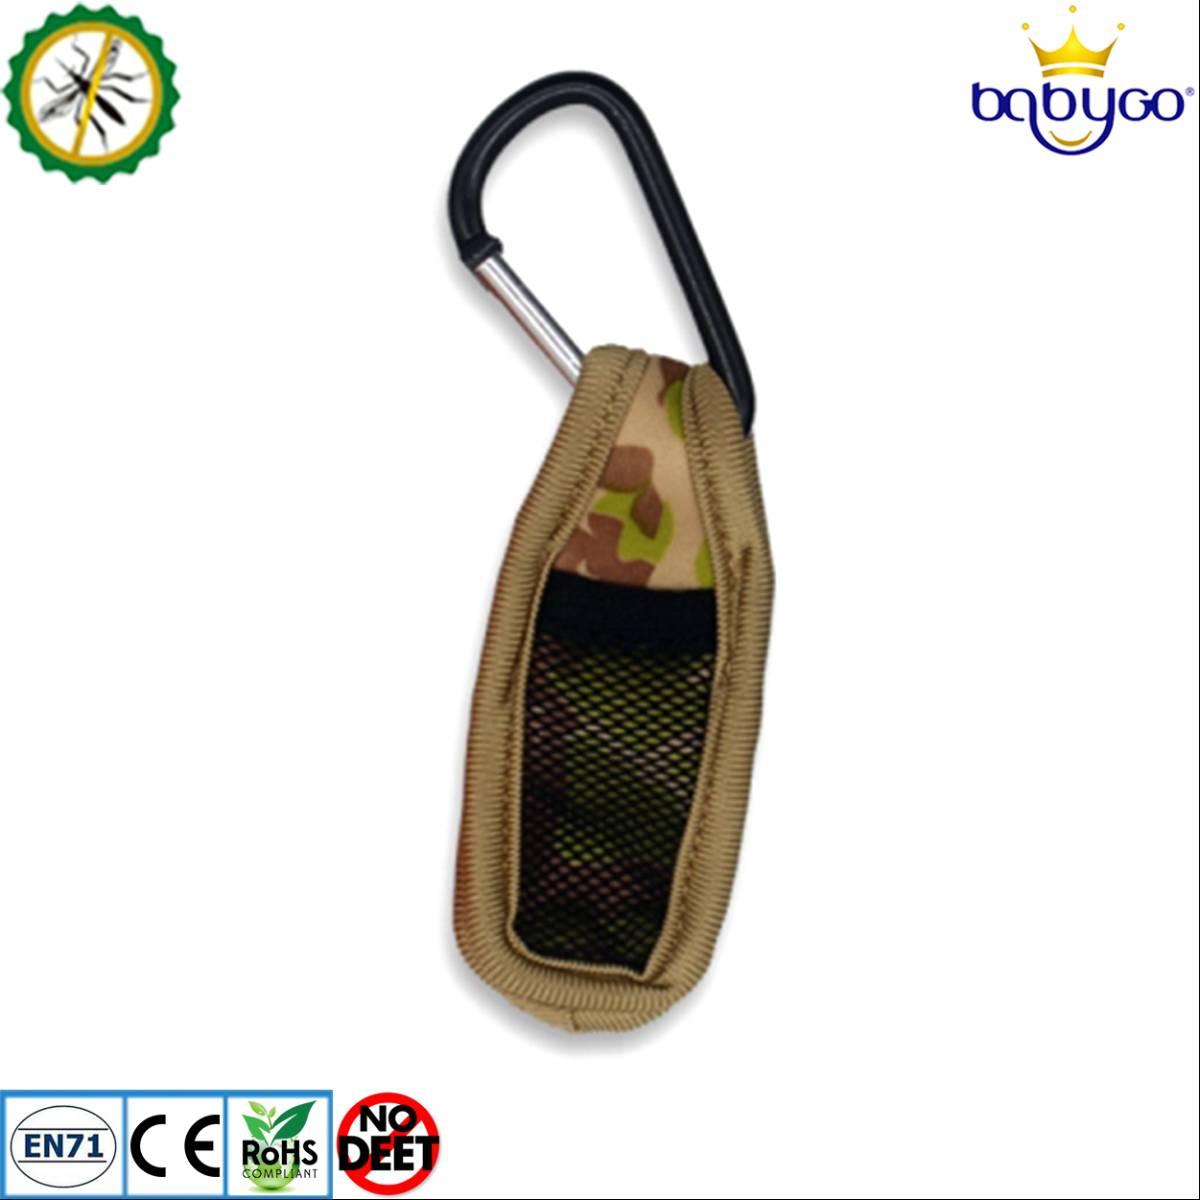 Babygo Neoprene Clip Mosquito Repellent Camouflage (klip Anti Nyamuk) Army